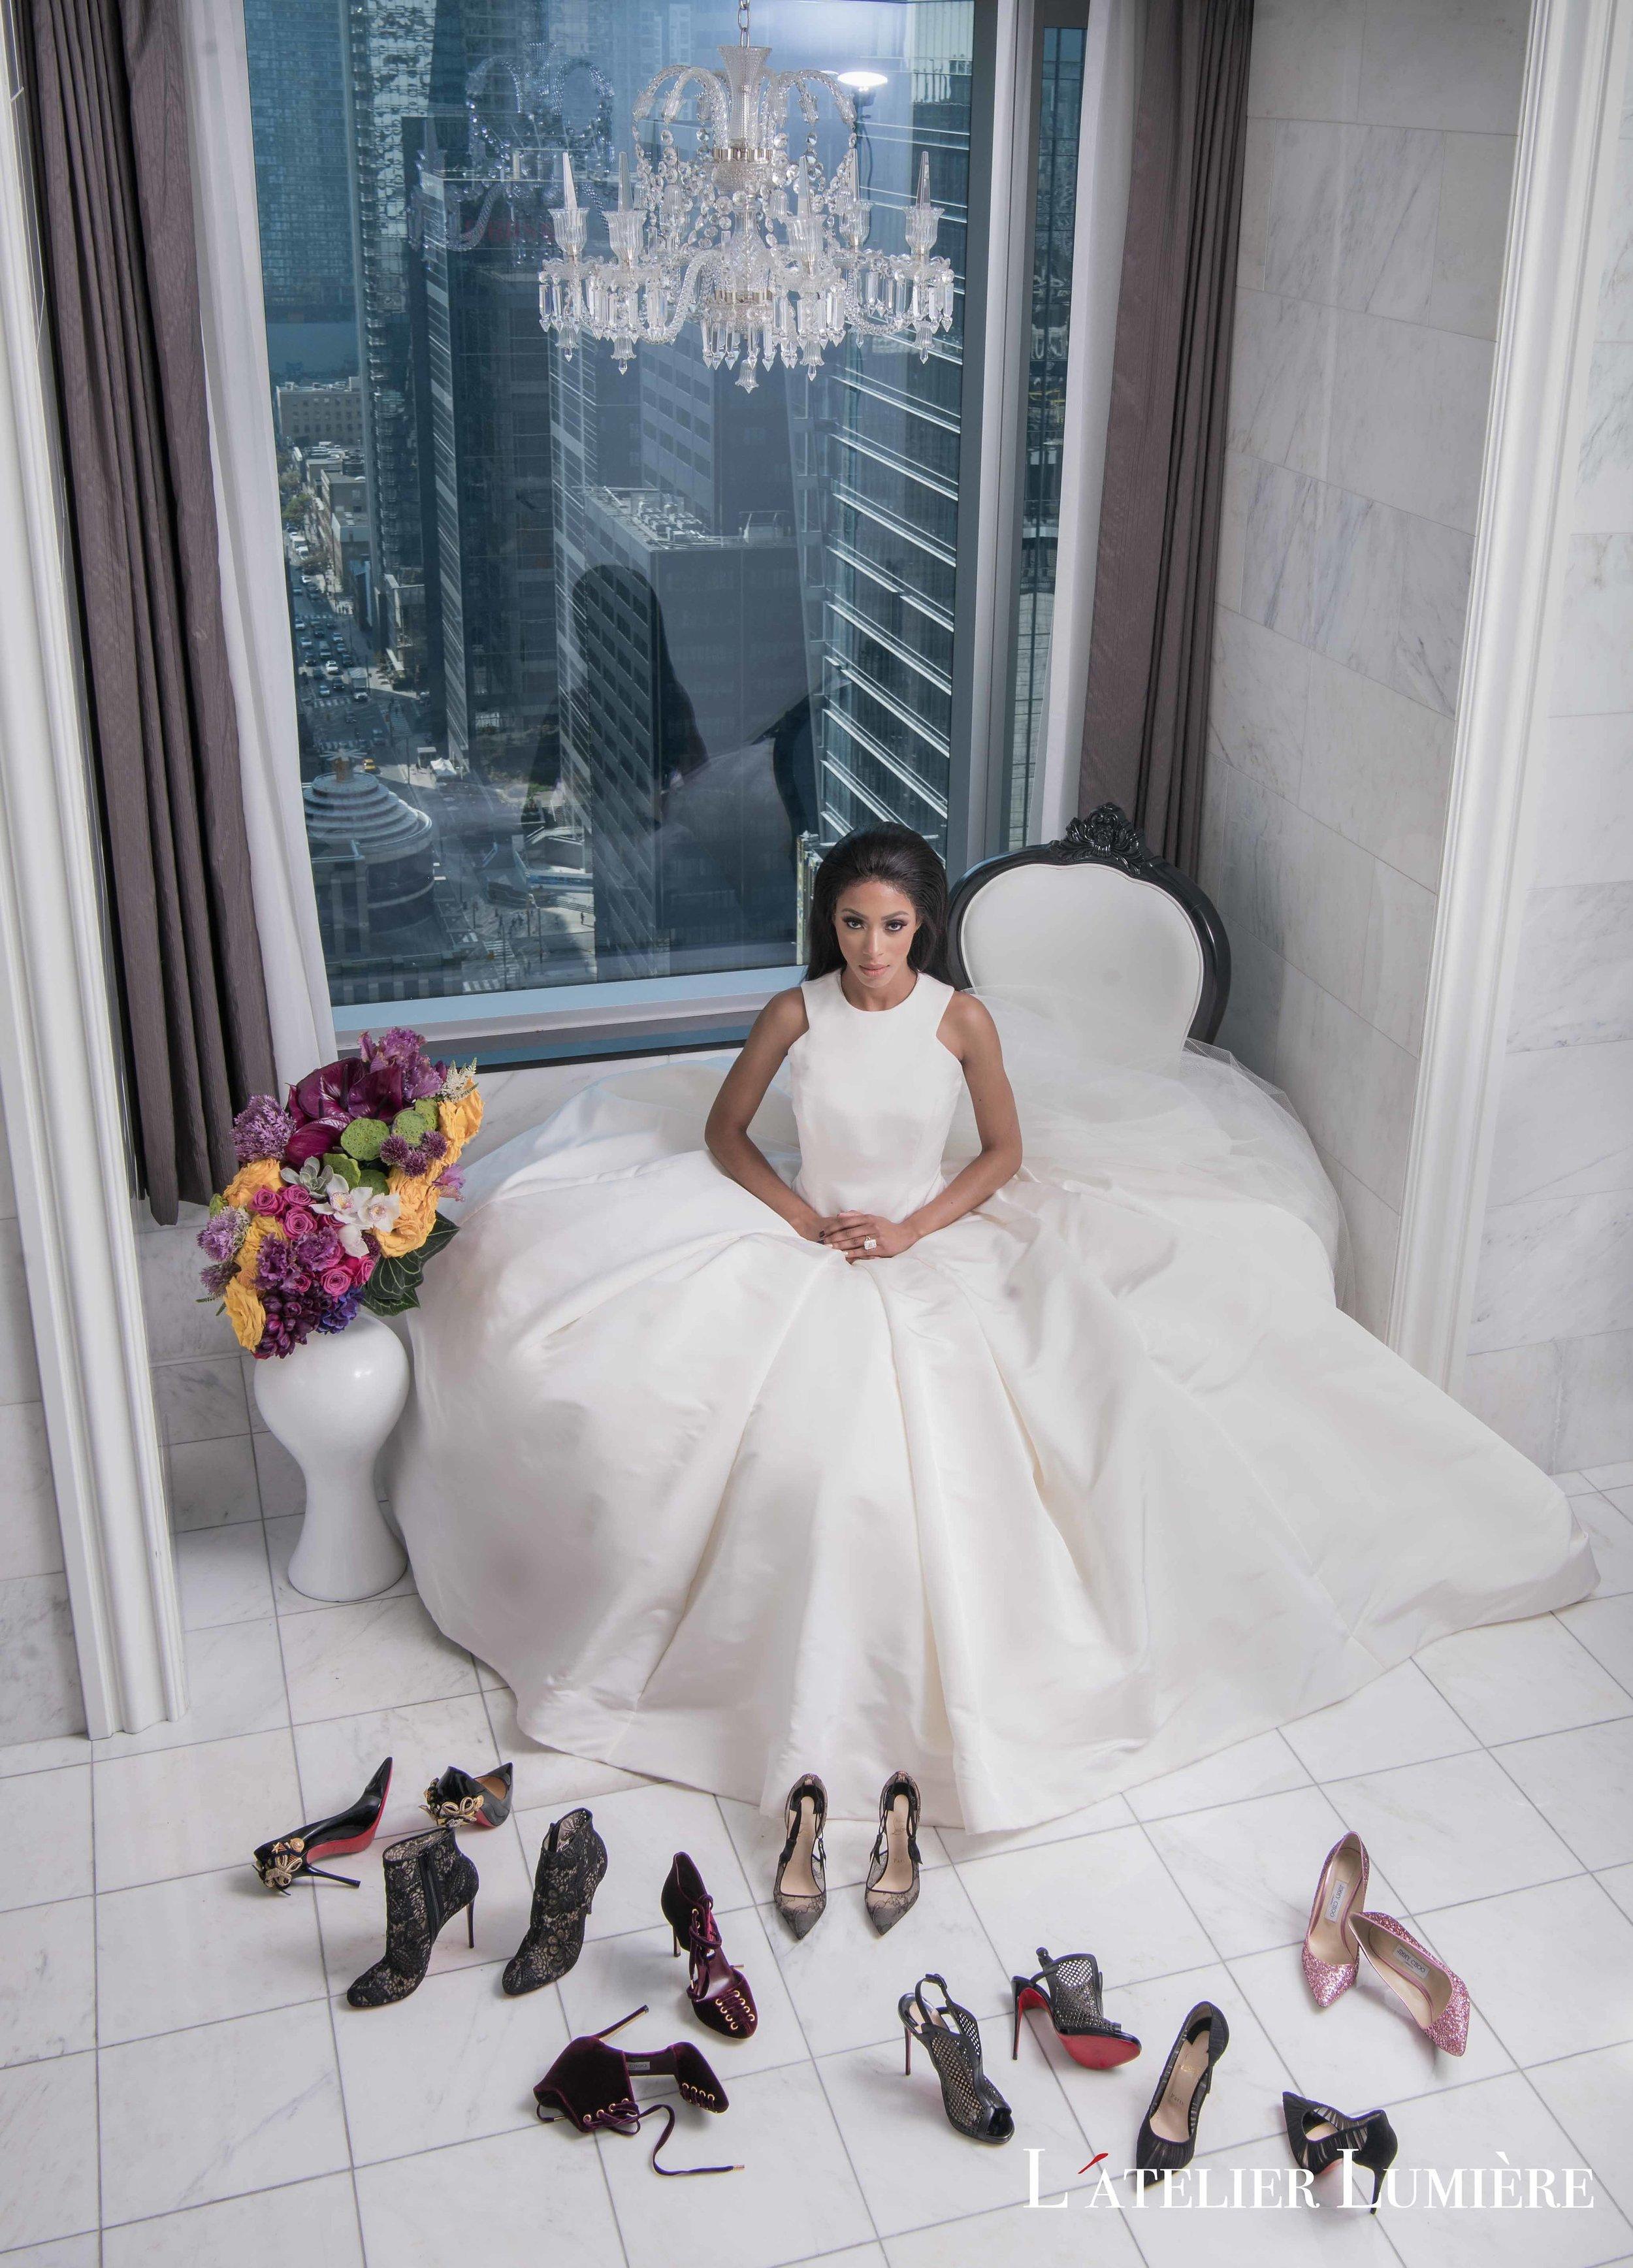 August In Bloom - Bride surrounded by heels - Riri (Grace Ormond Wedding)